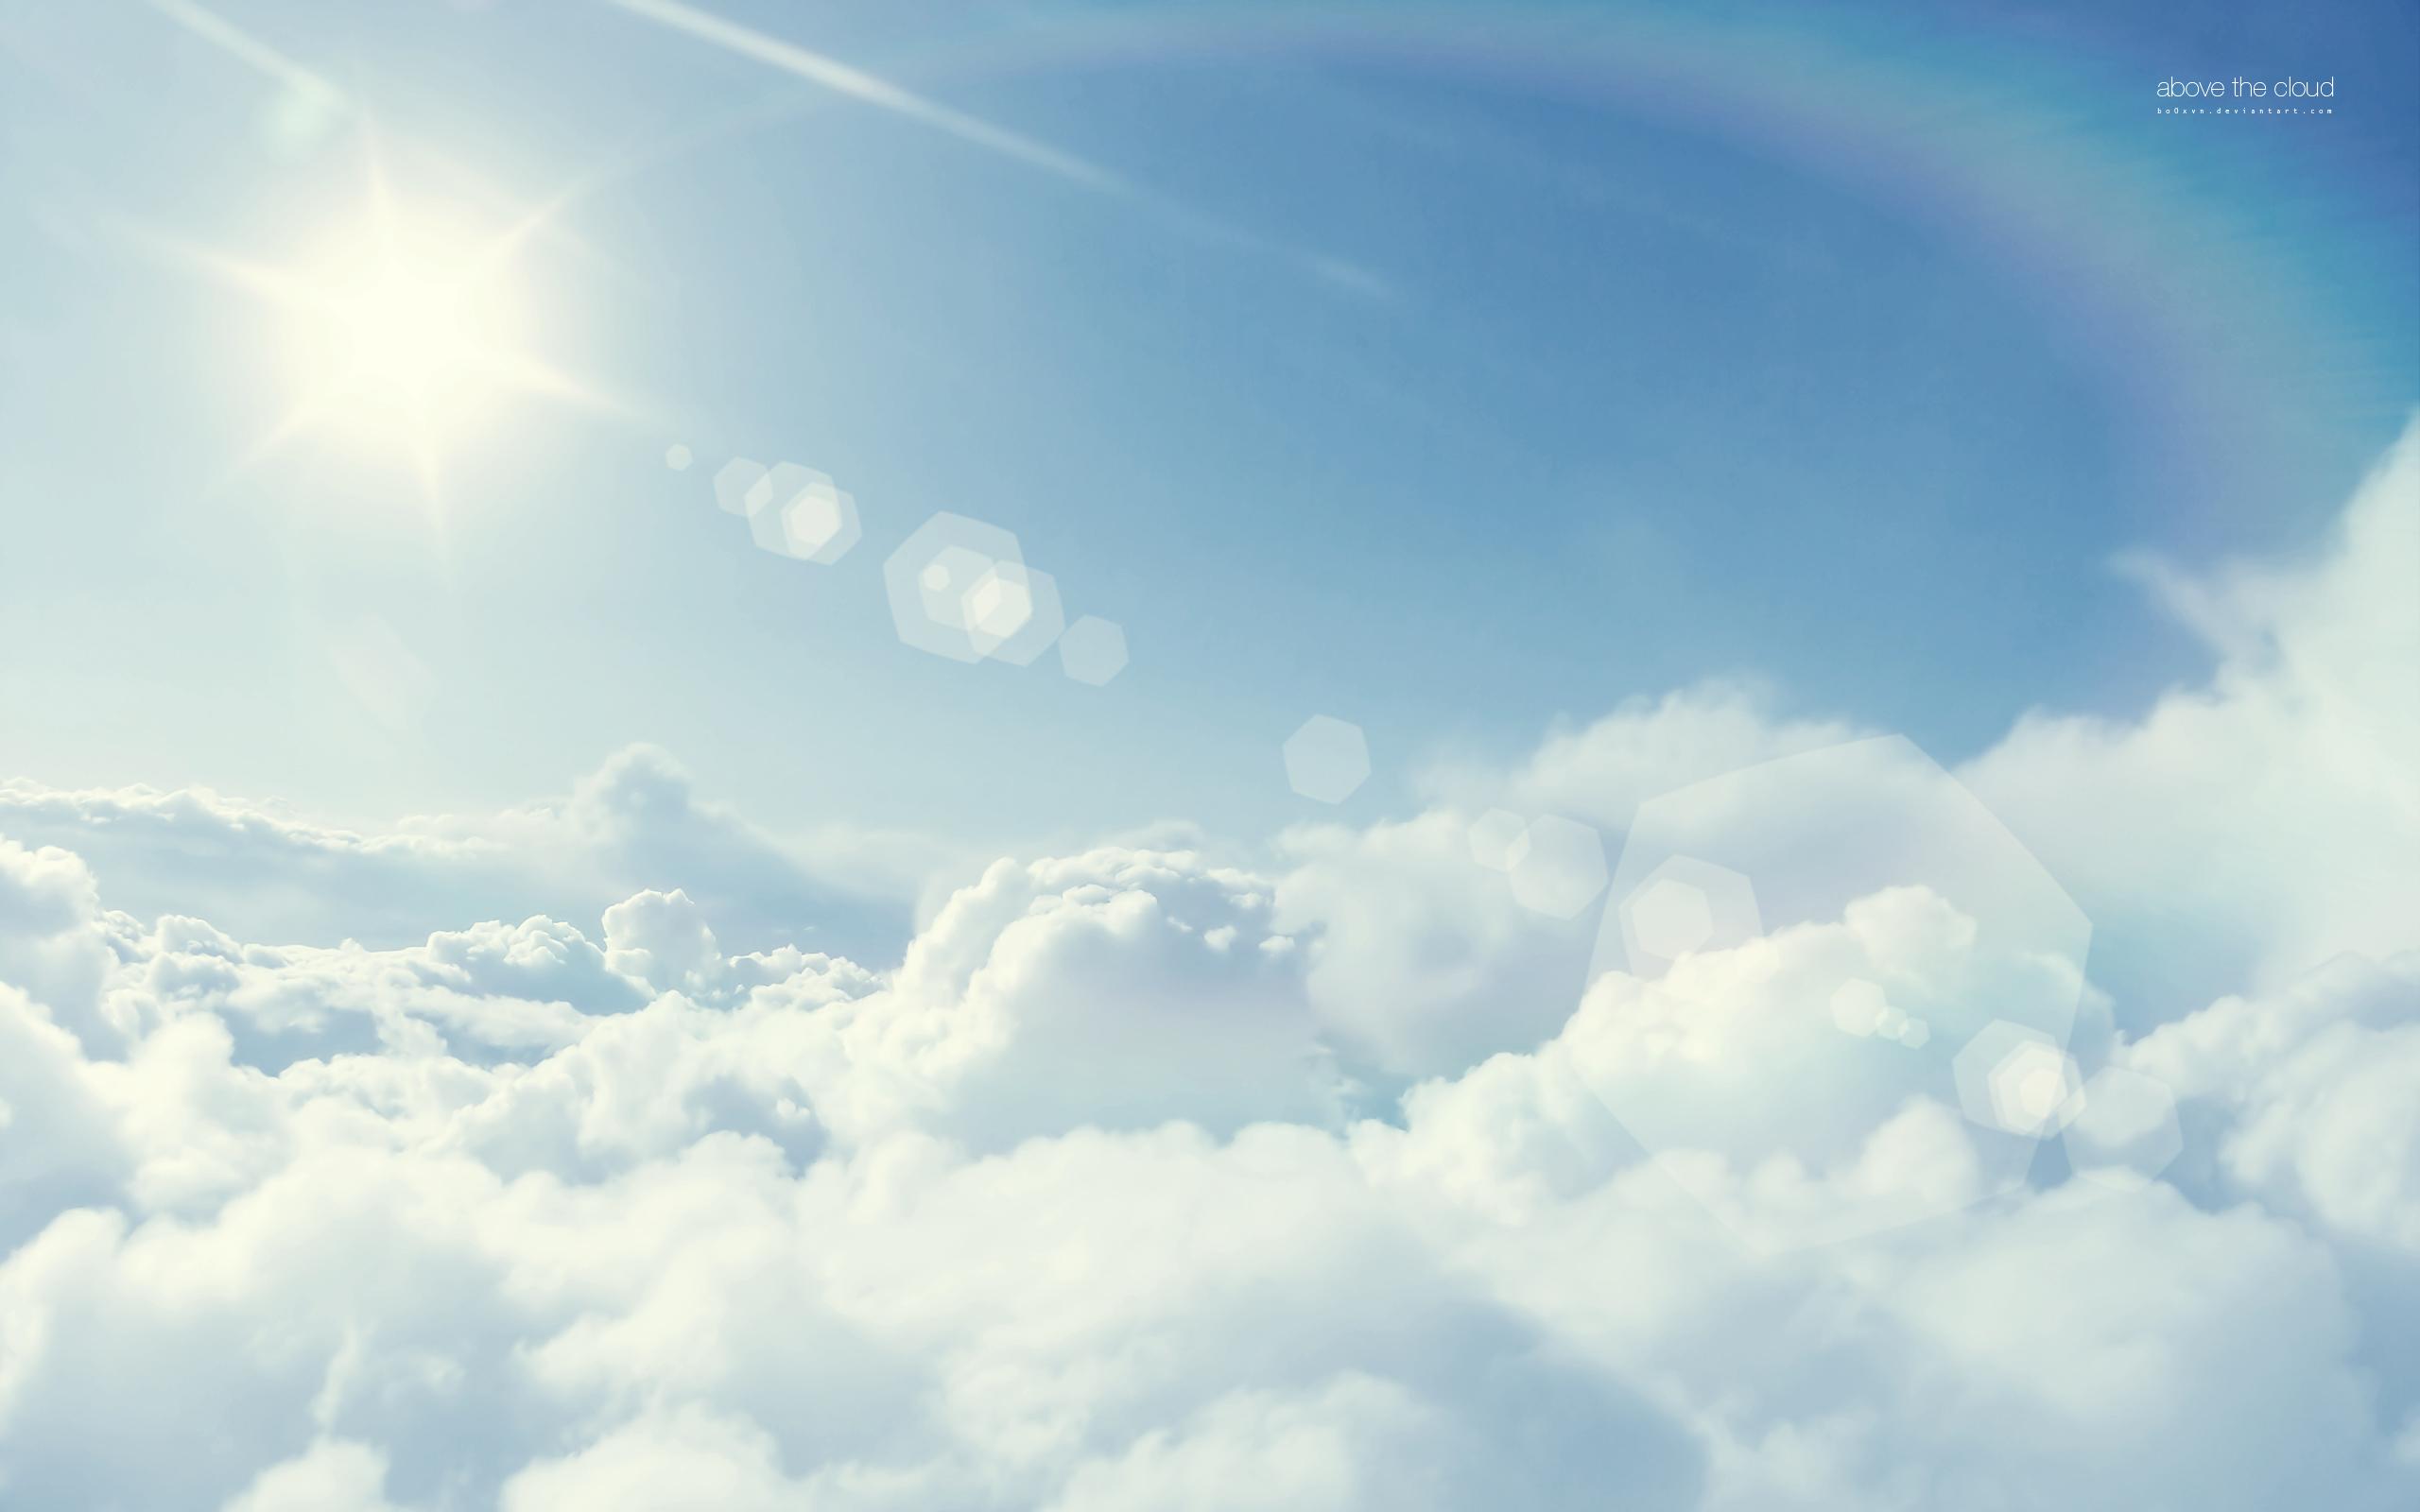 Cloud Wallpaper: Wonderful Cloud Wallpaper Hd Background 2560x1600px